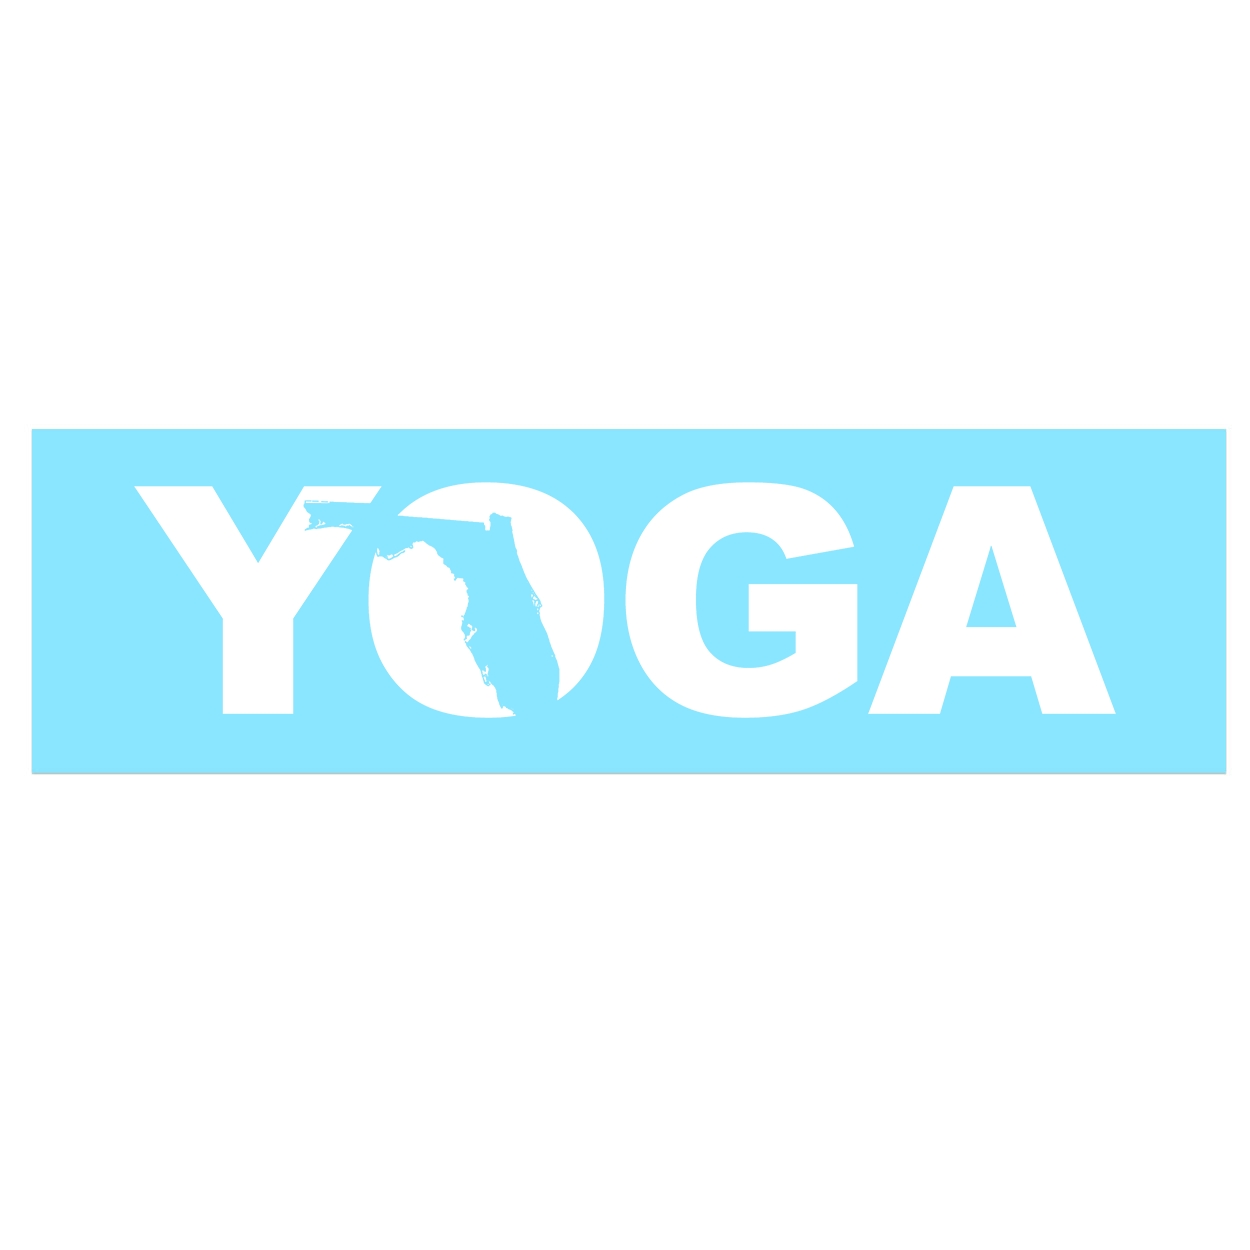 Yoga Florida Classic Decal (White Logo)